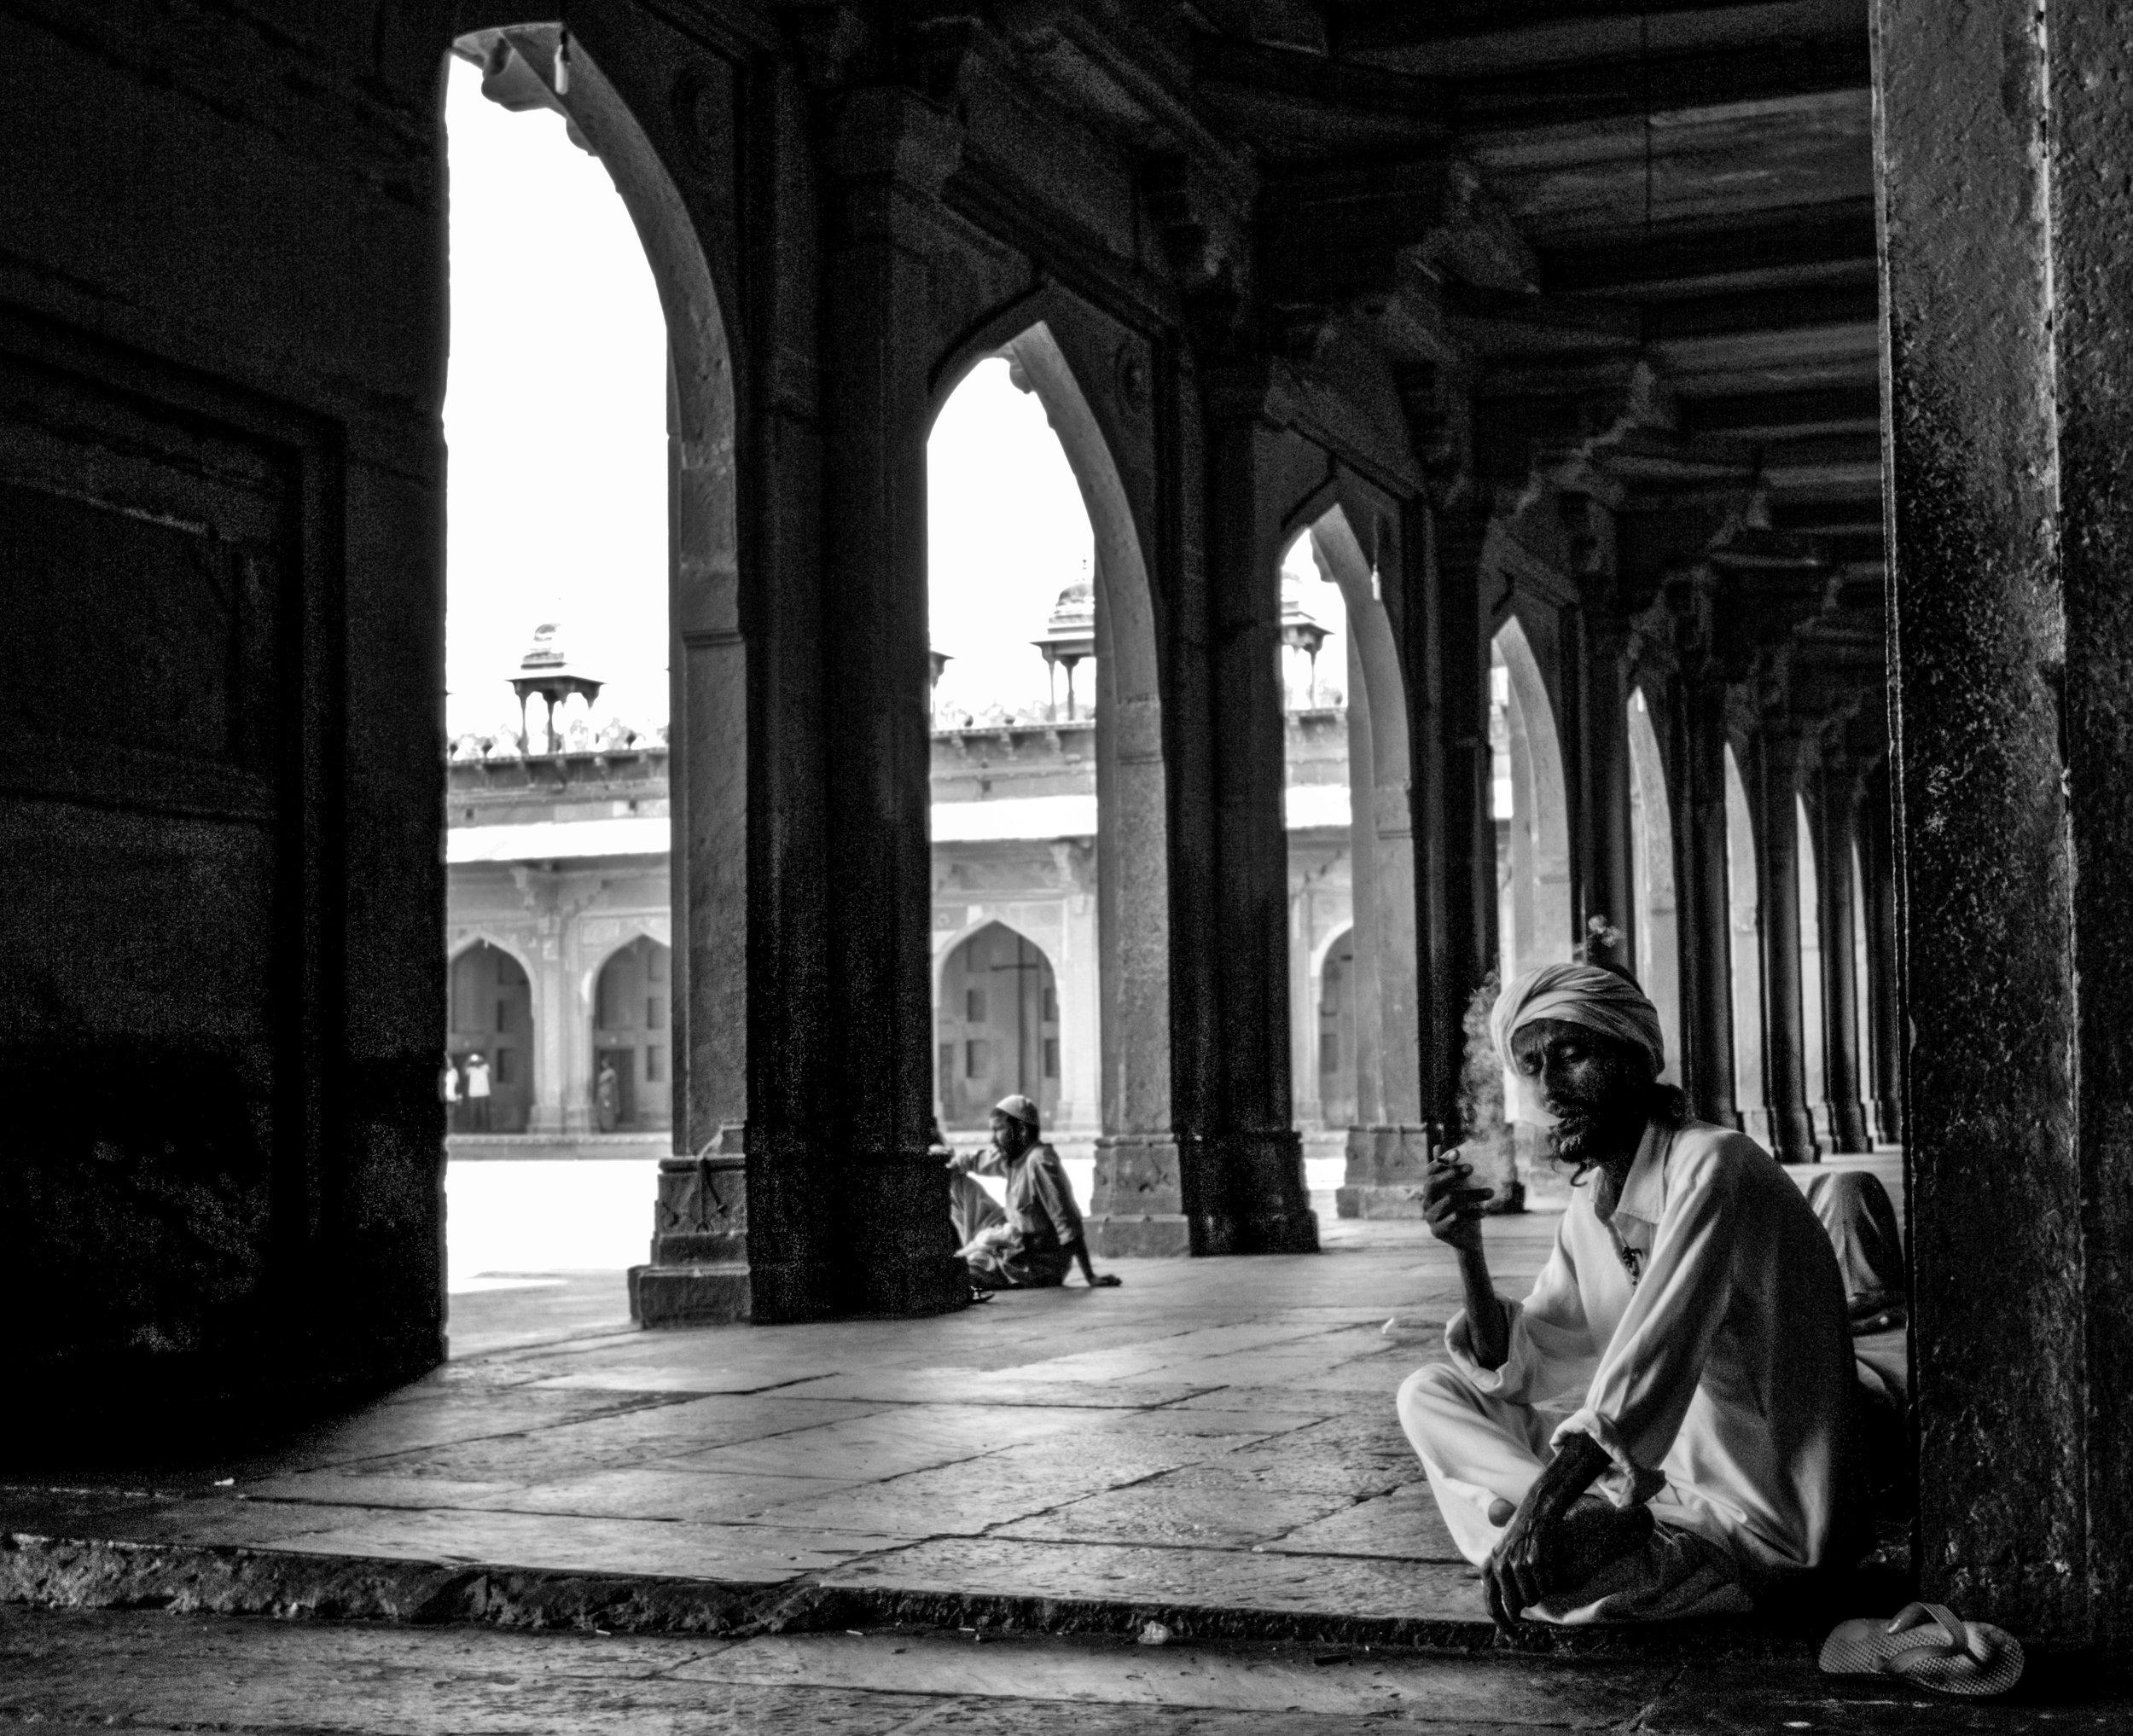 Agra, India